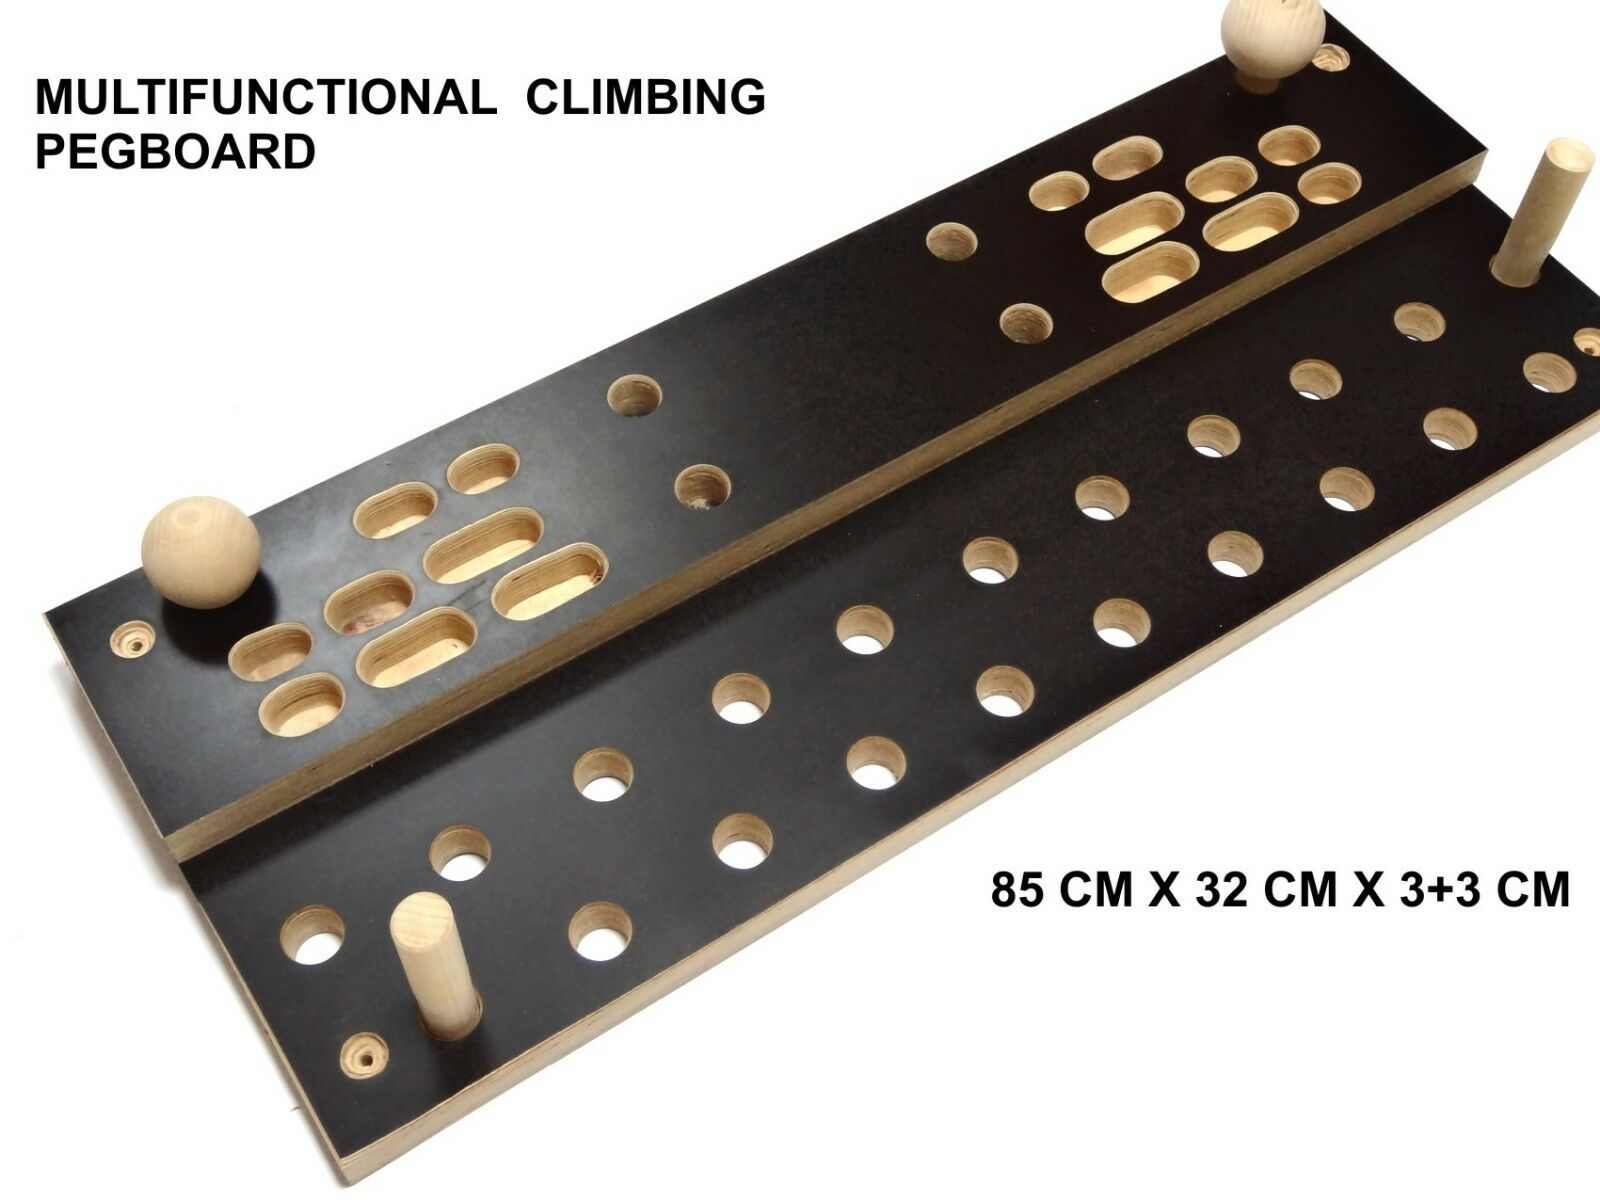 MG® Trainingsboard Steckbrett Klettergriffe Seitenlänge pegboard klettertraining